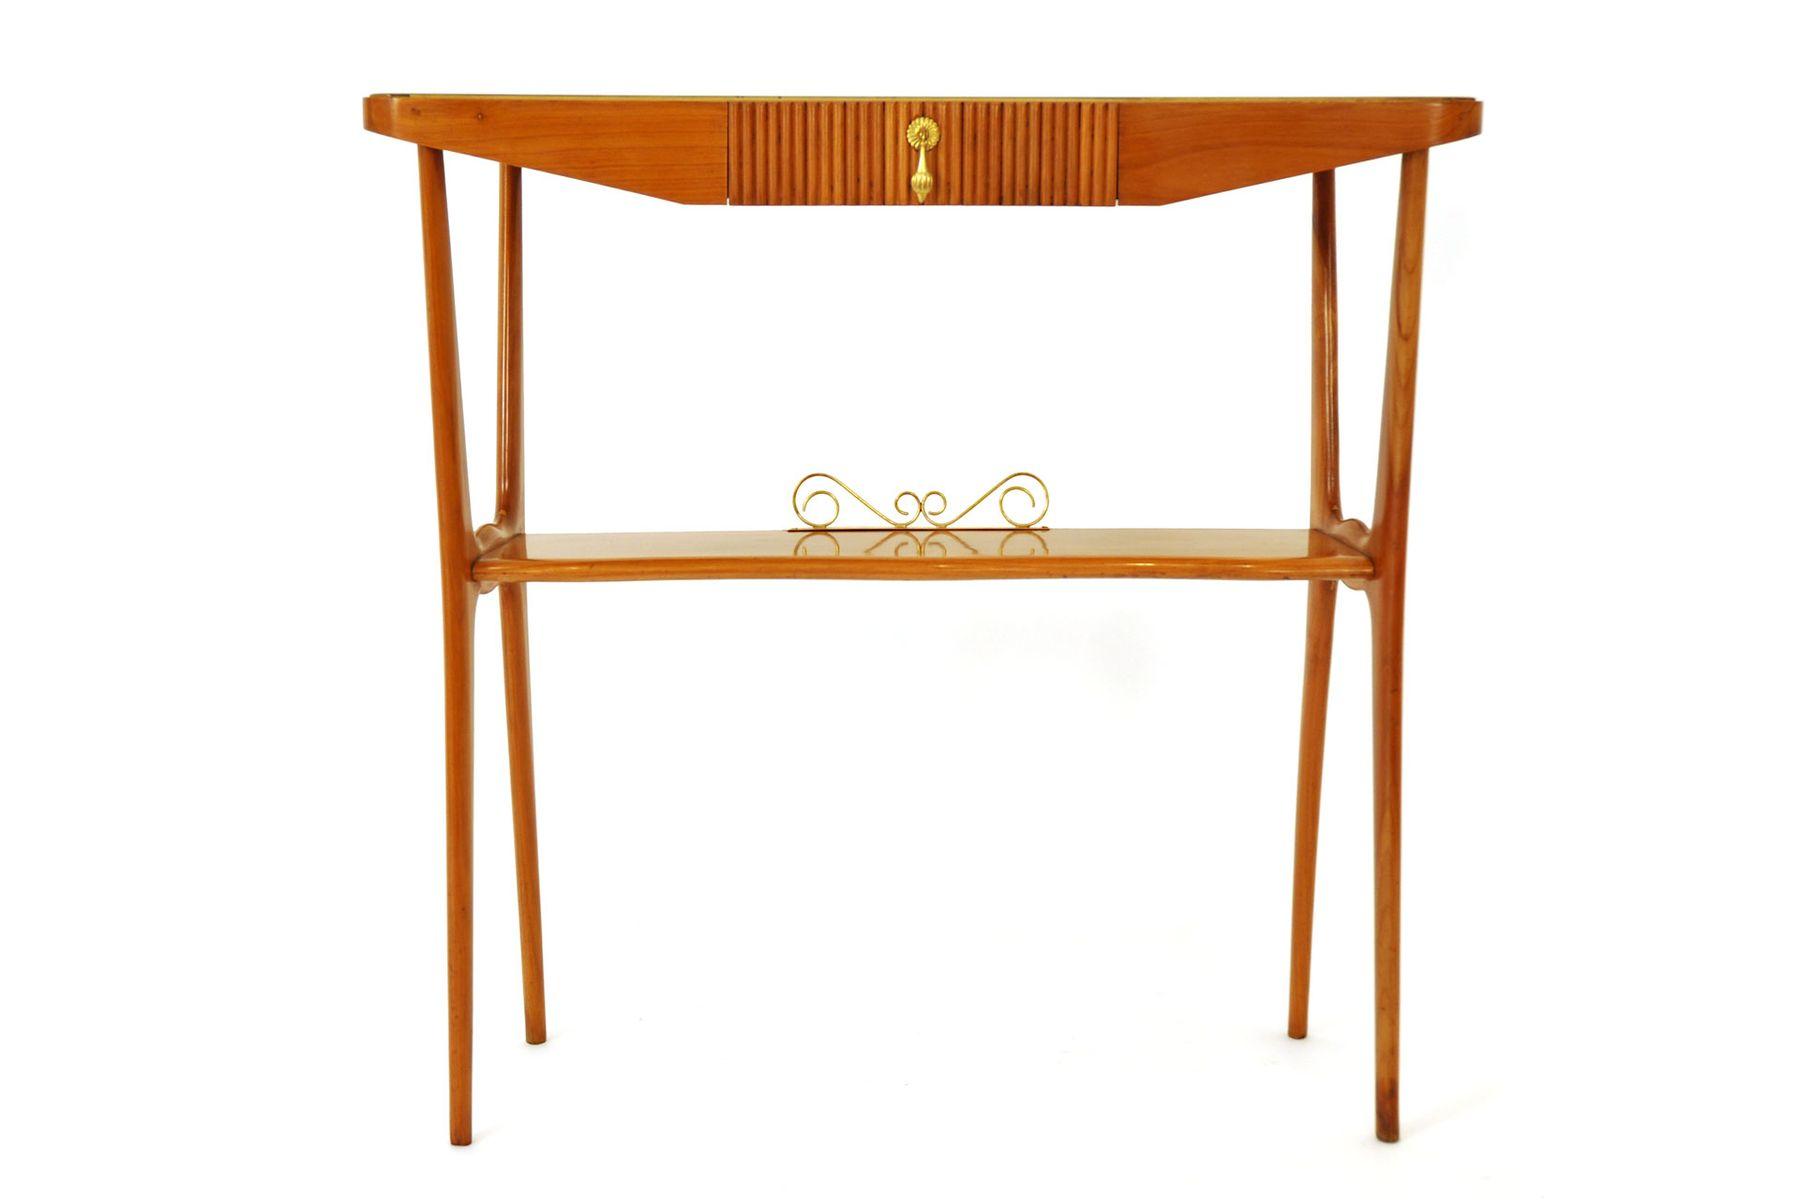 Wonderful Italian Wood U0026 Glass Console Table, 1950s For Sale At Pamono